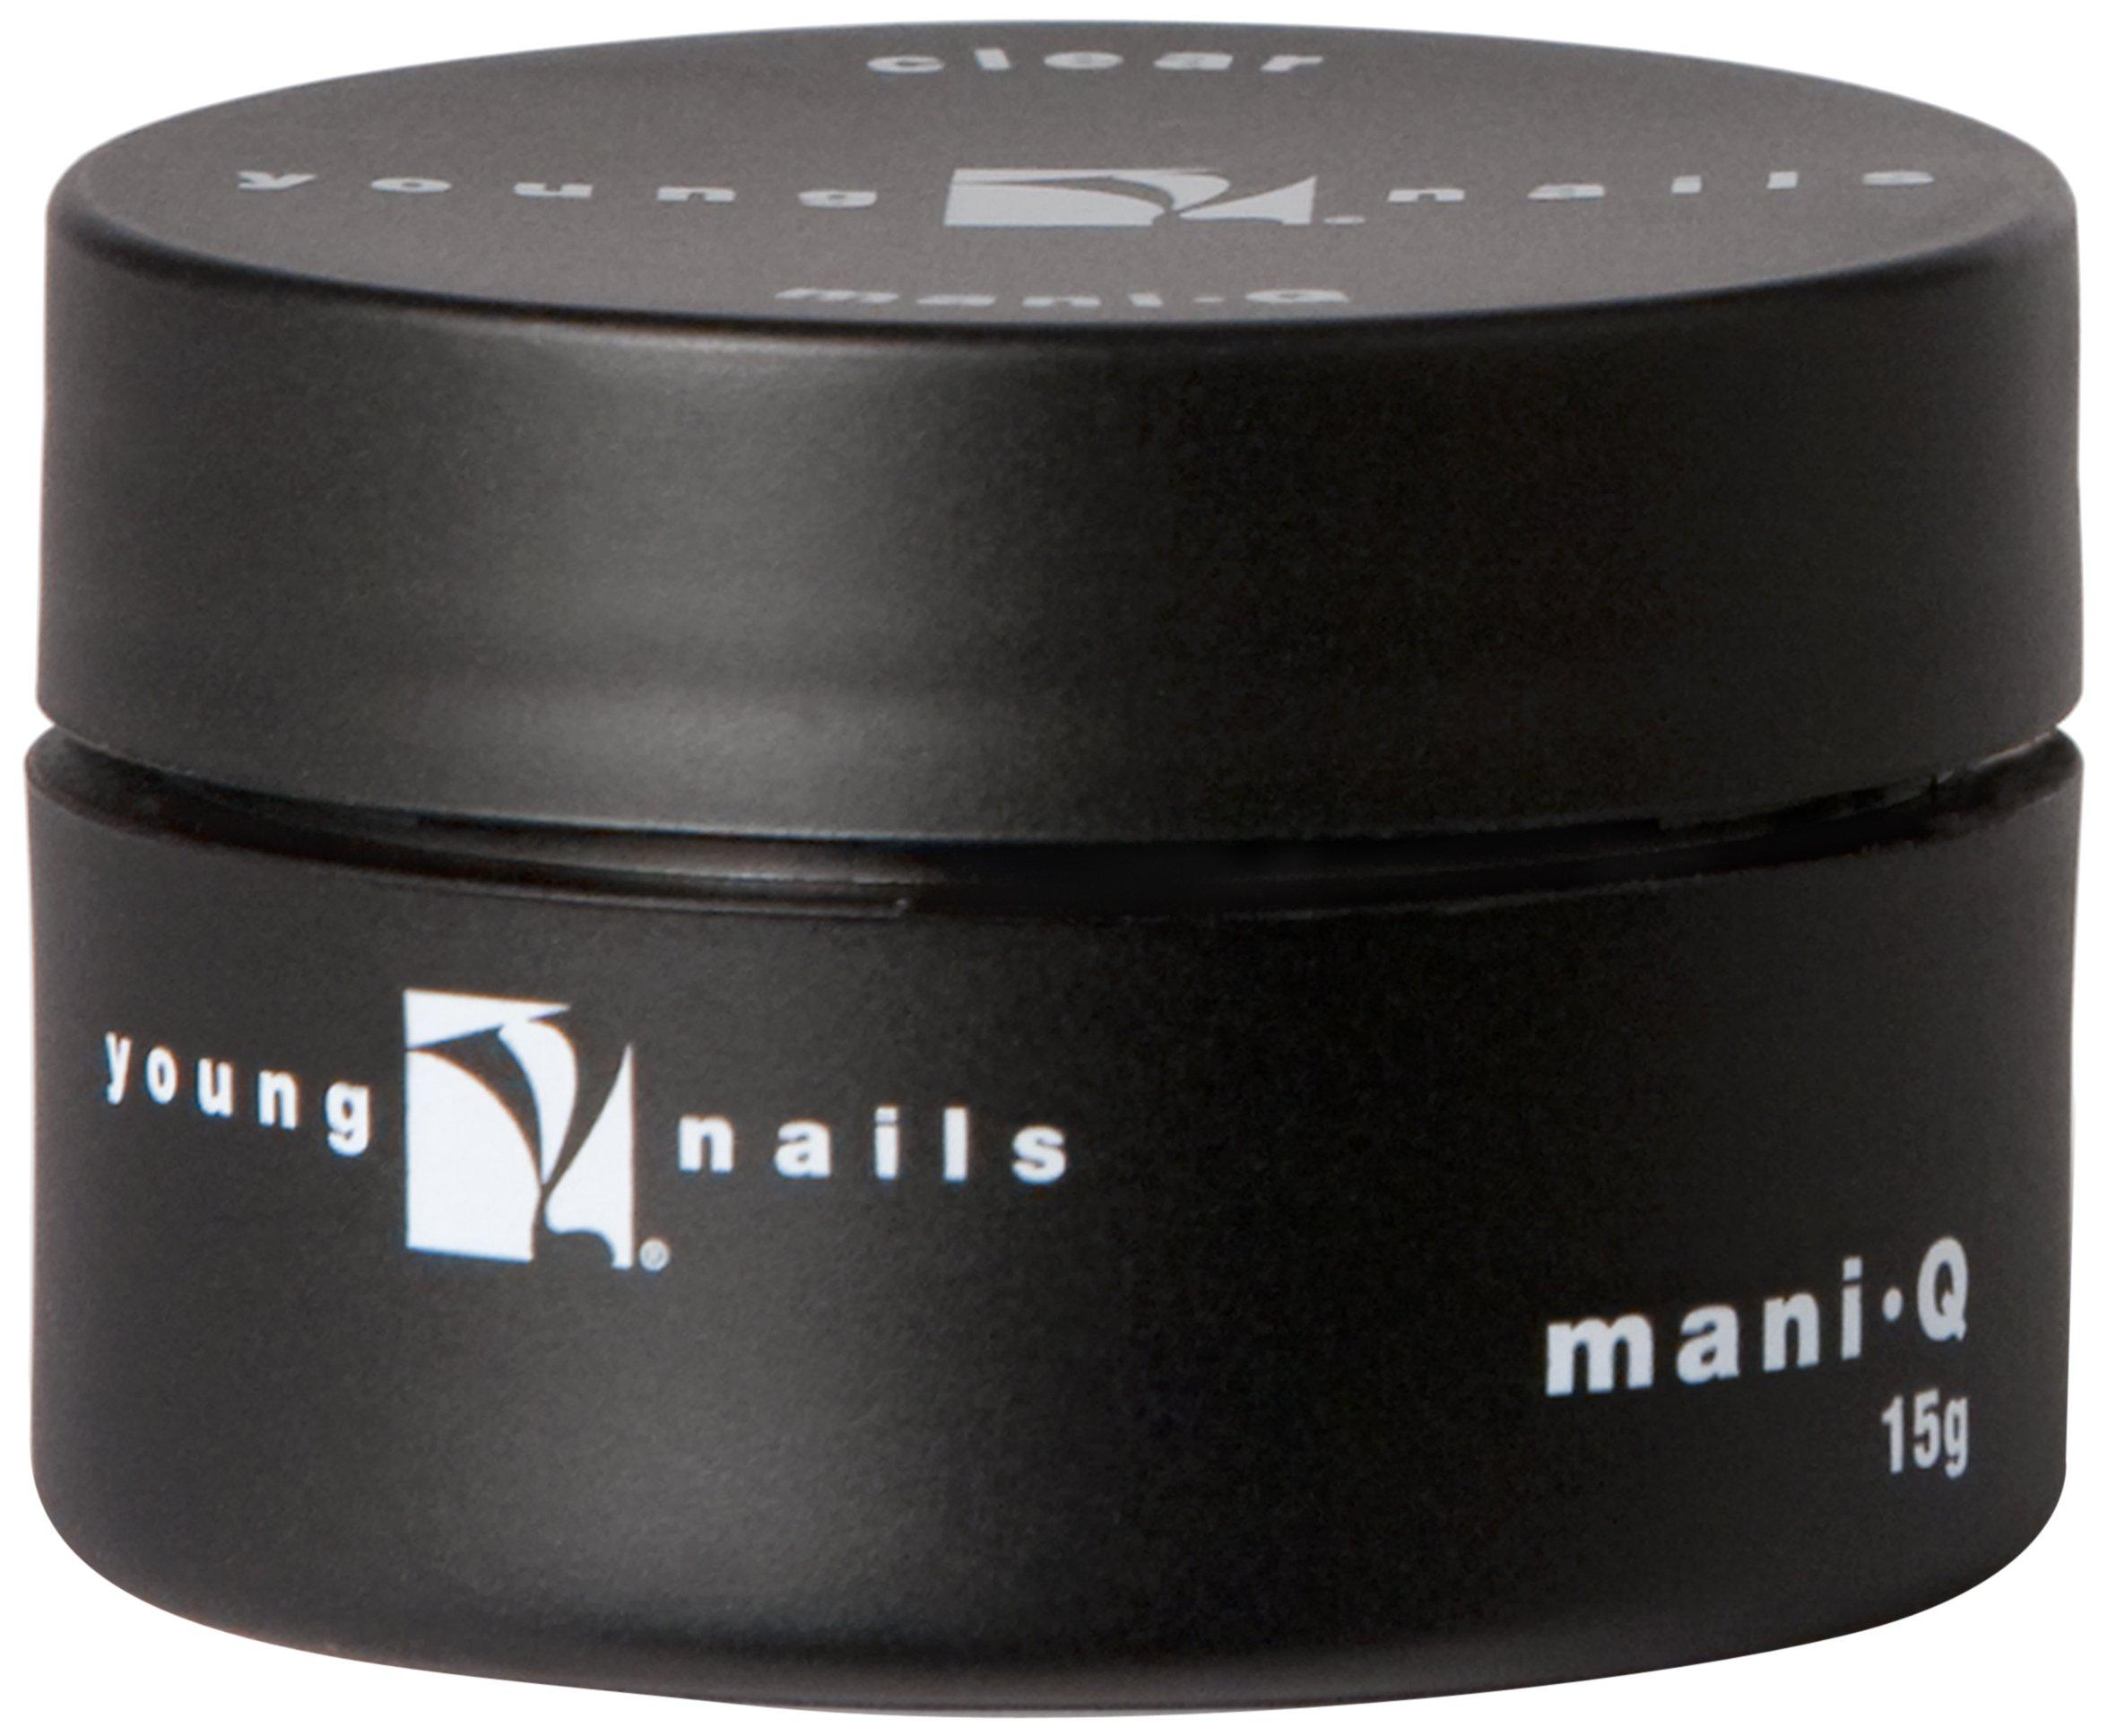 Young Nails Mani Q, 15 Gram